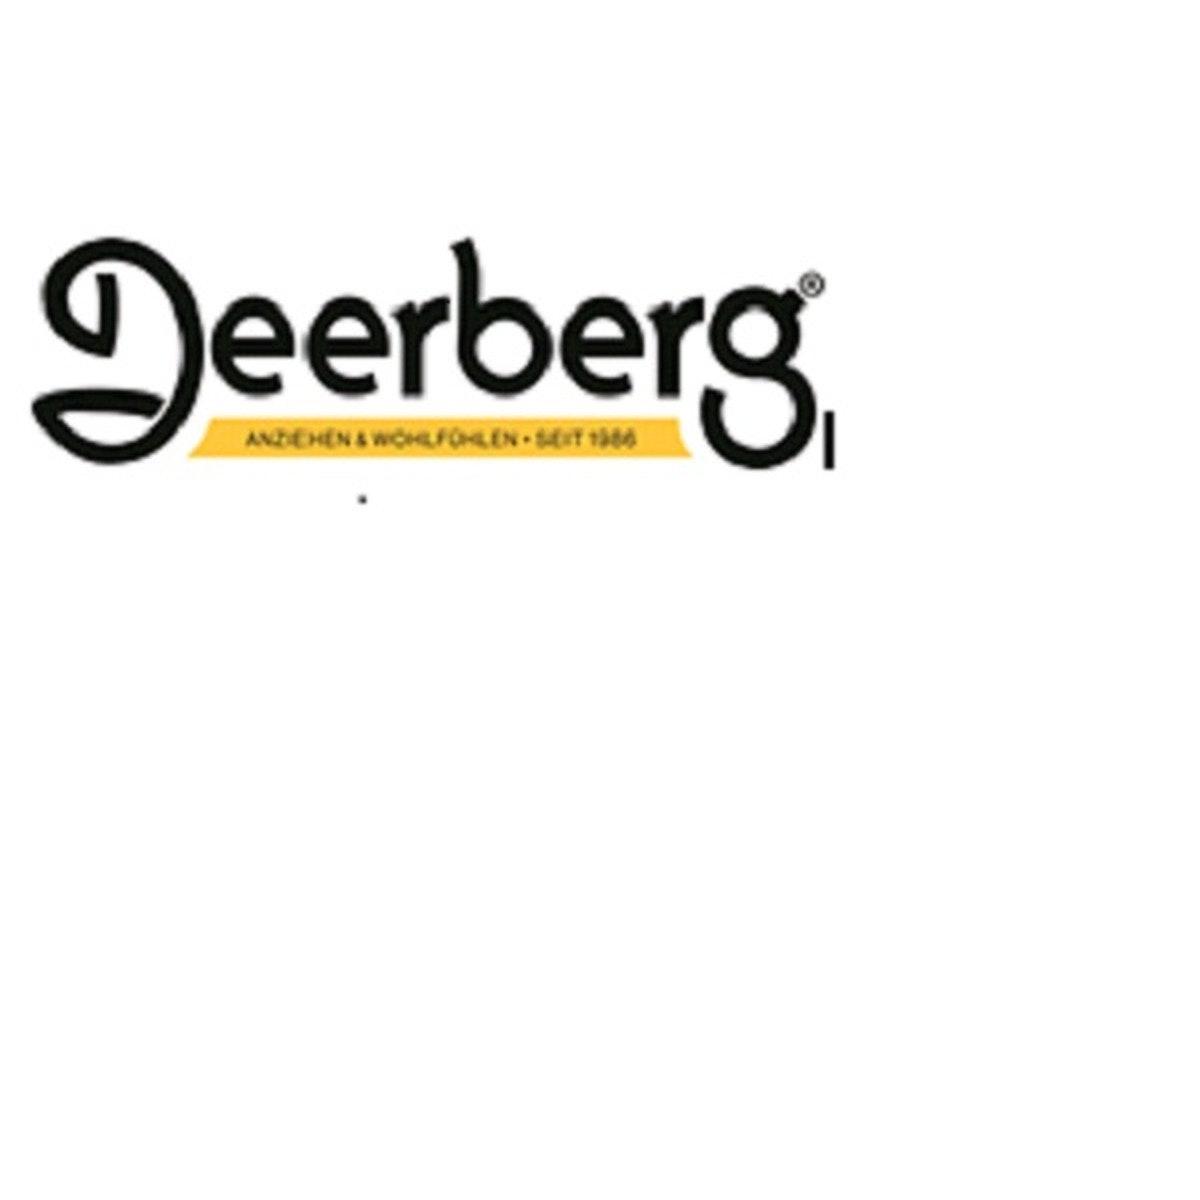 Deerberg GmbH